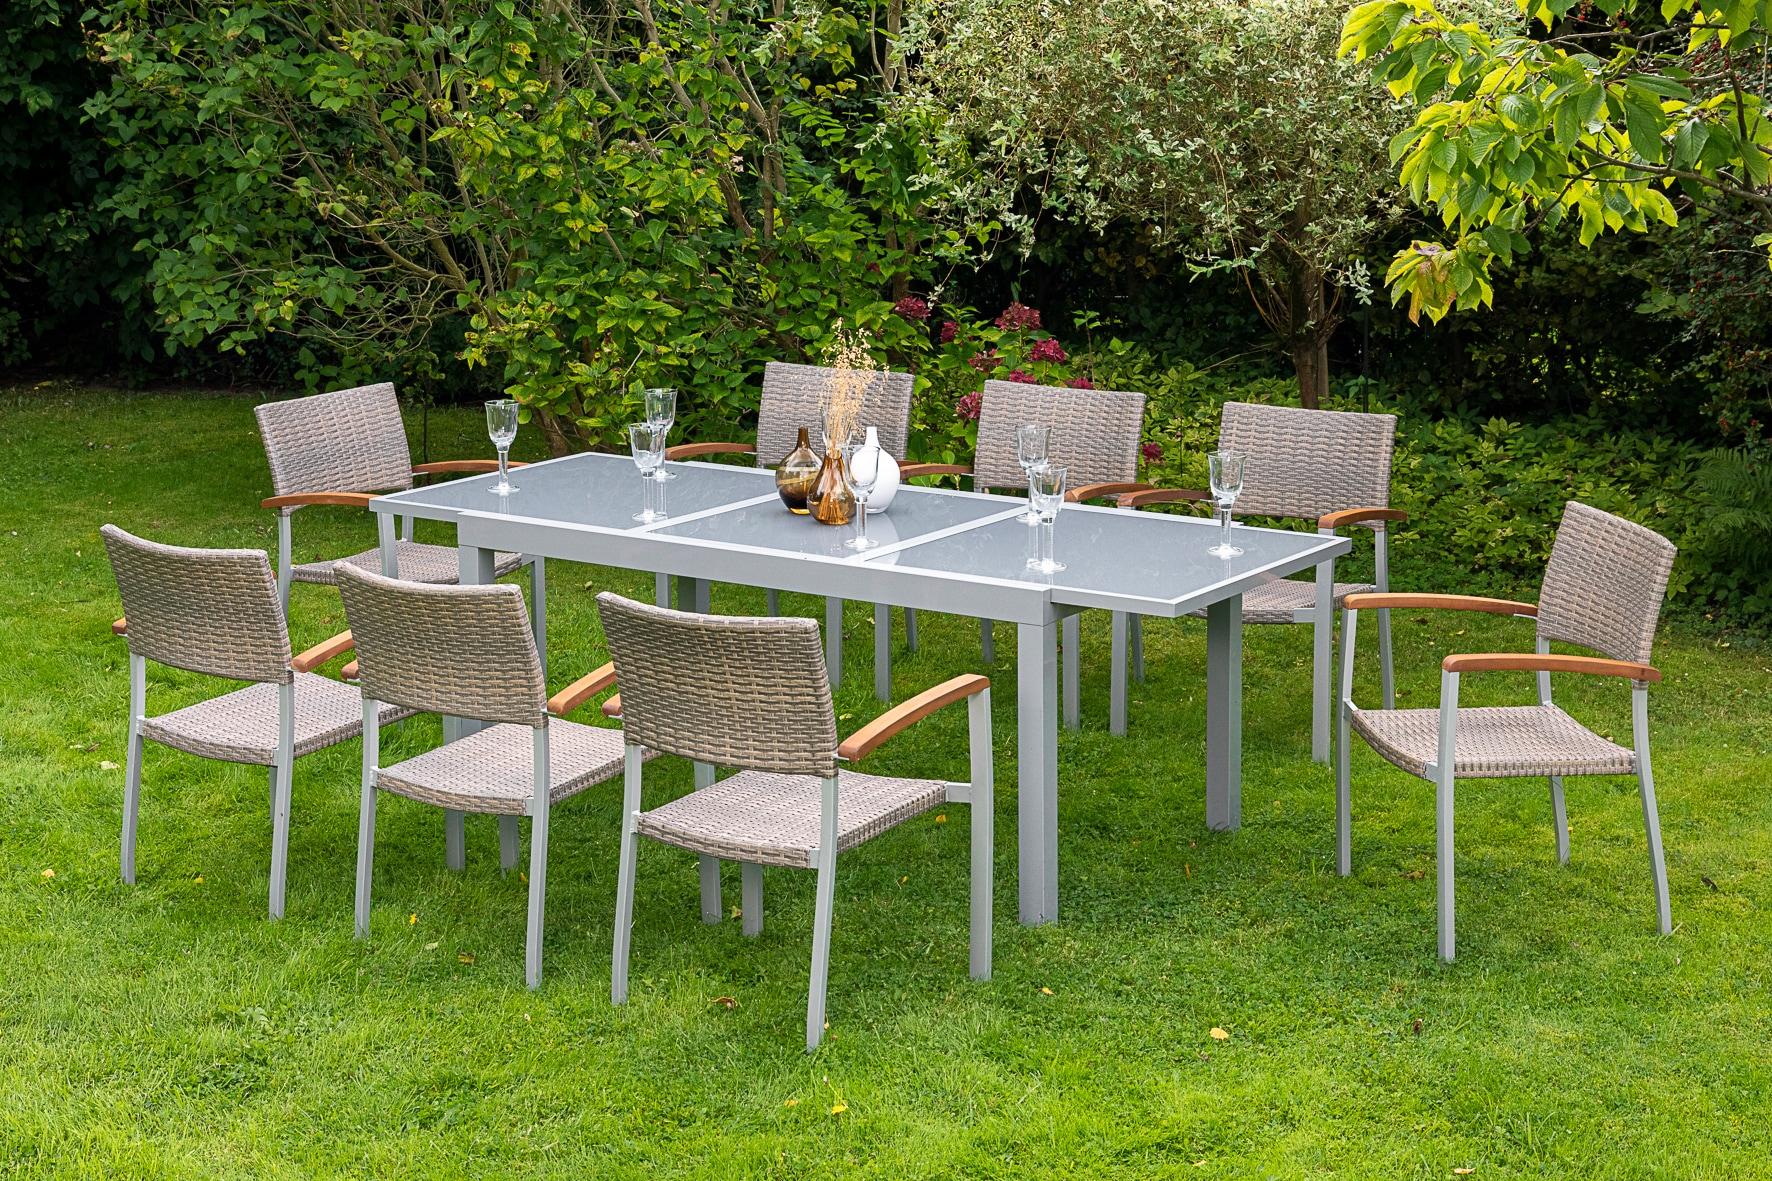 MERXX Diningset Silano 9-tlg 8 Sessel Tisch 90x160(220) cm